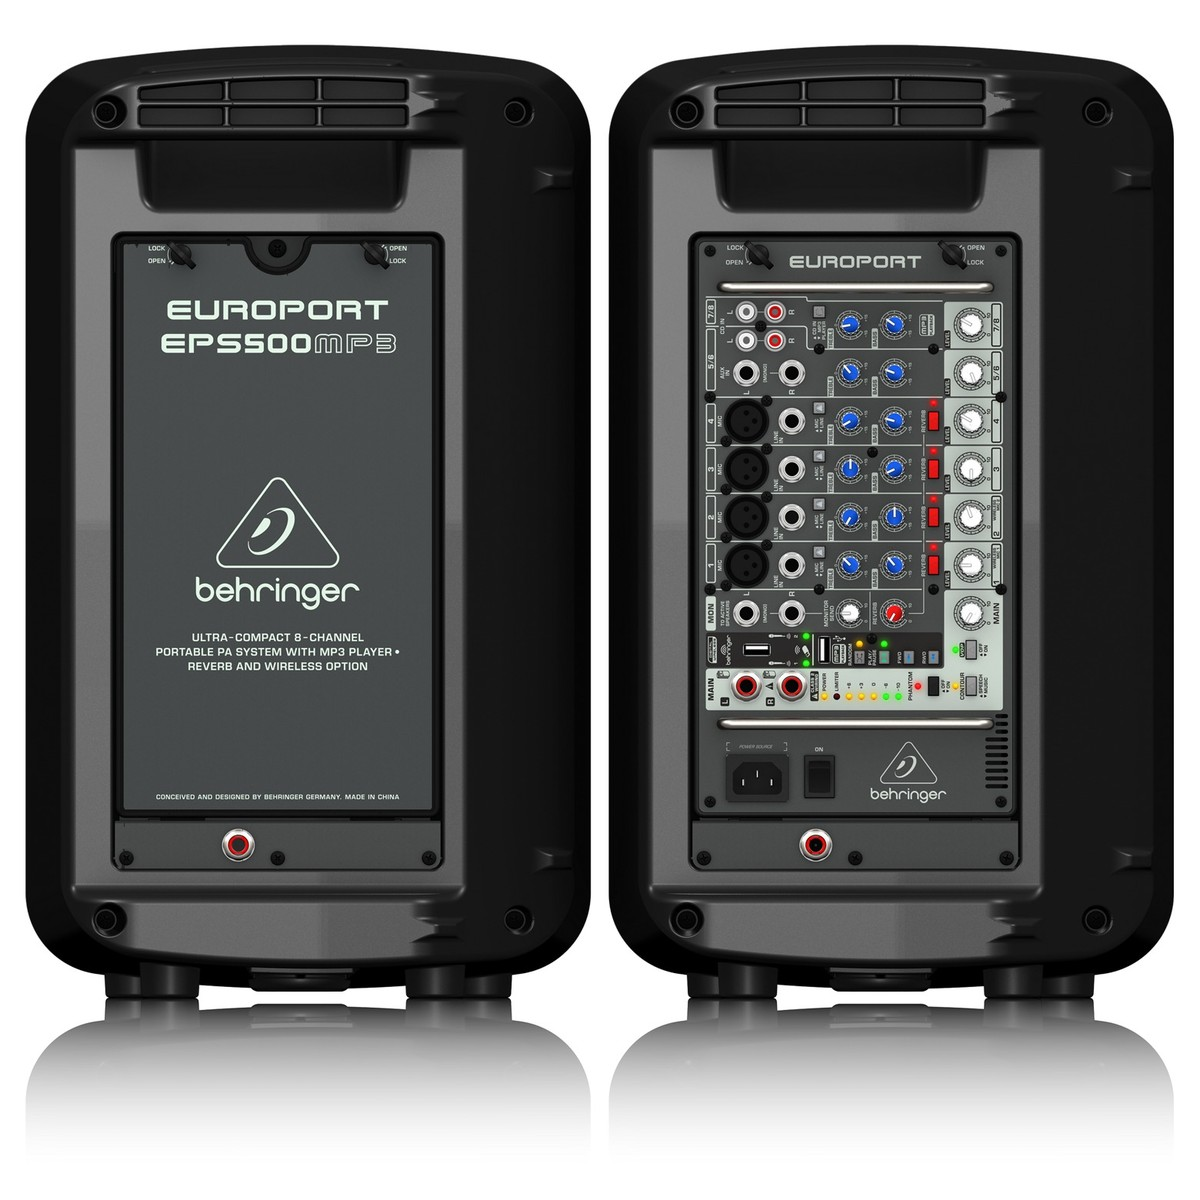 behringer eps500 mp3 portable pa system at gear4music. Black Bedroom Furniture Sets. Home Design Ideas